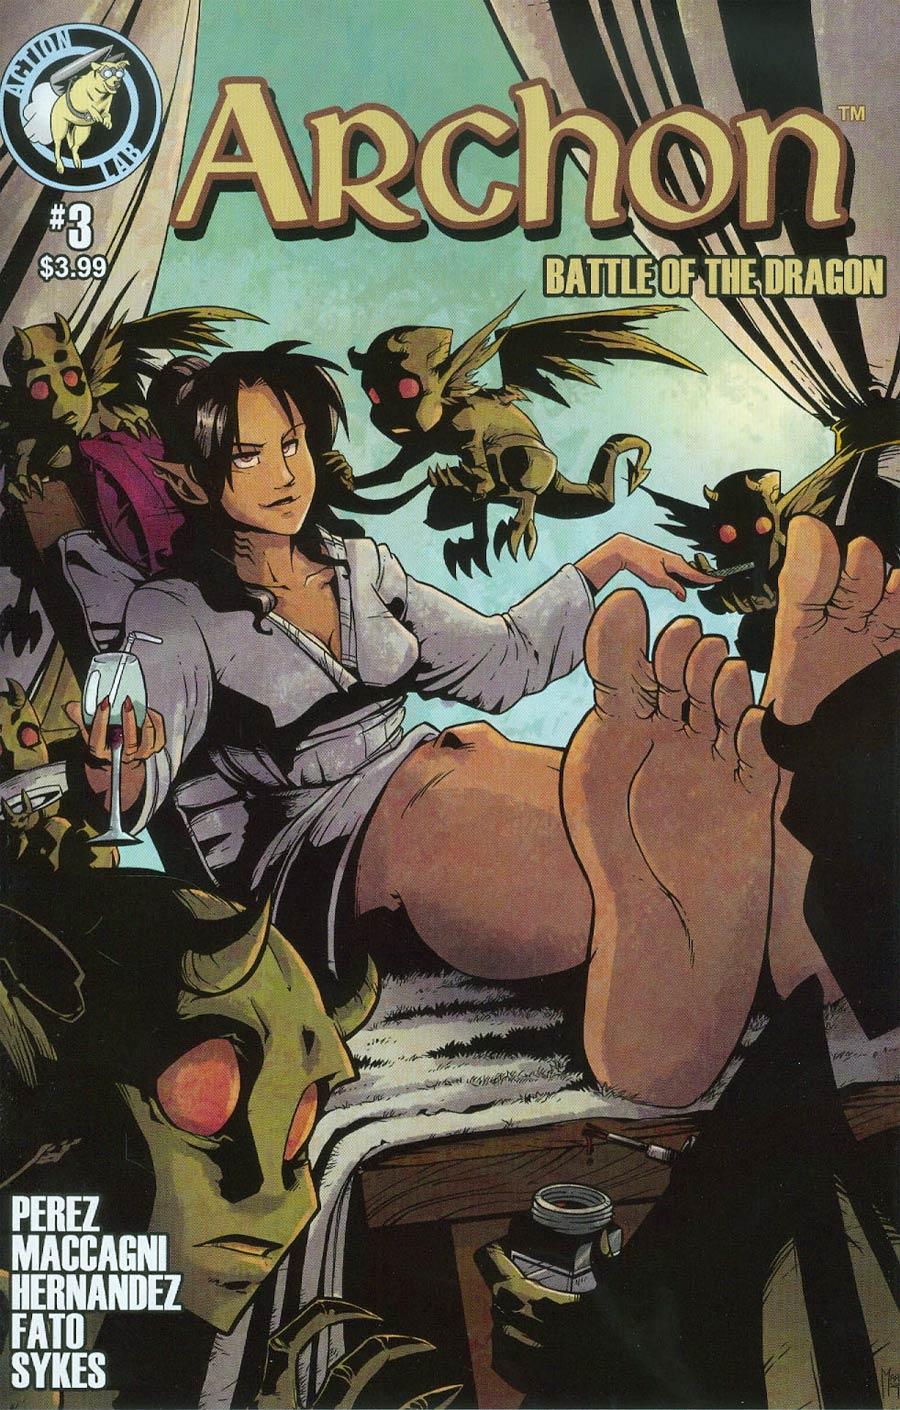 Archon Battle Of The Dragon #3